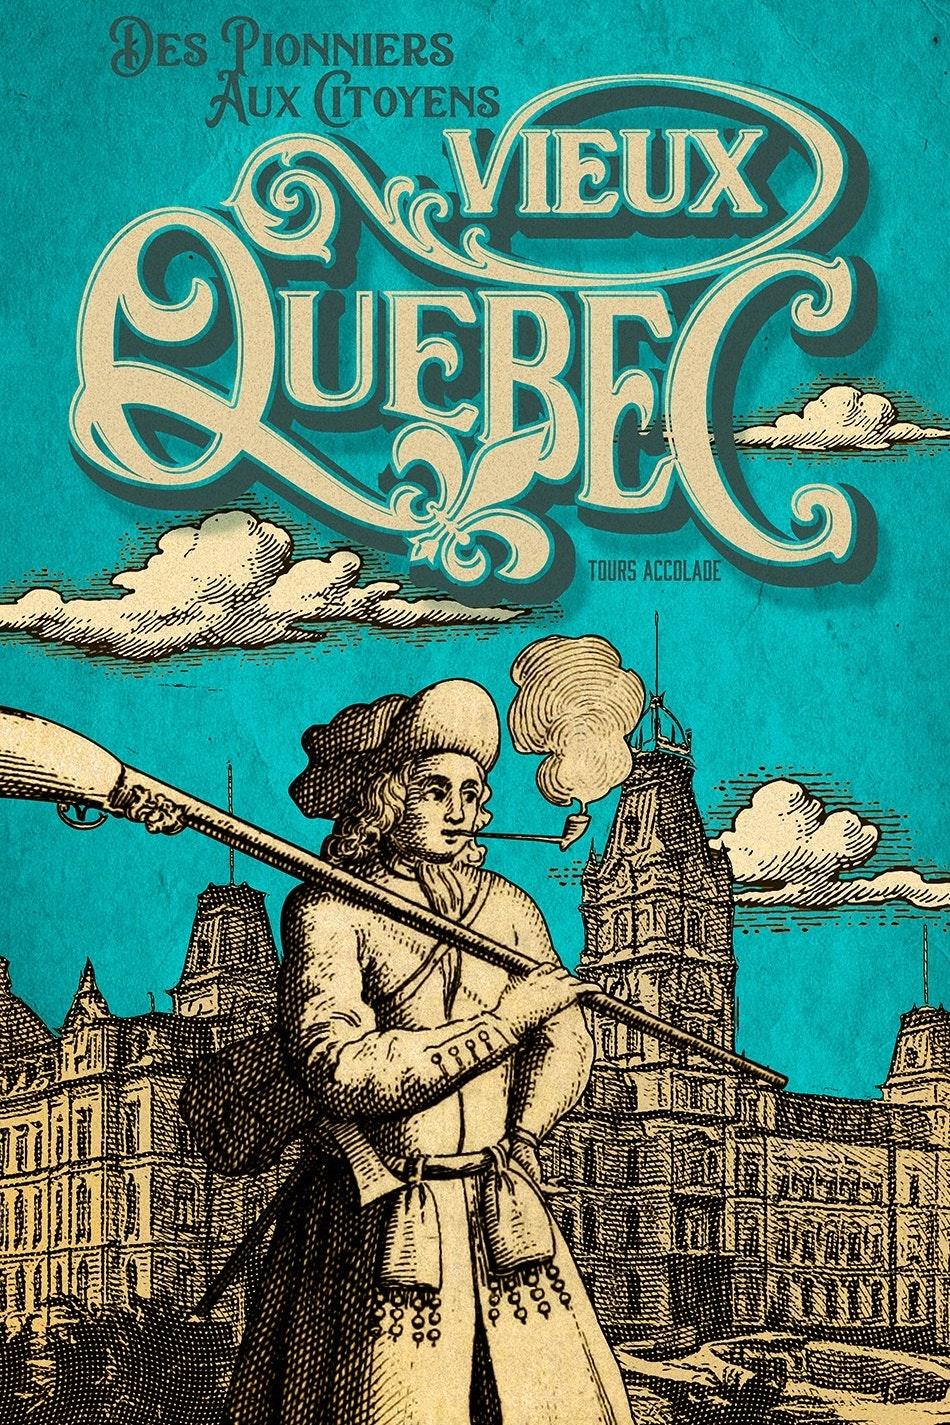 Travel poster for Quebec